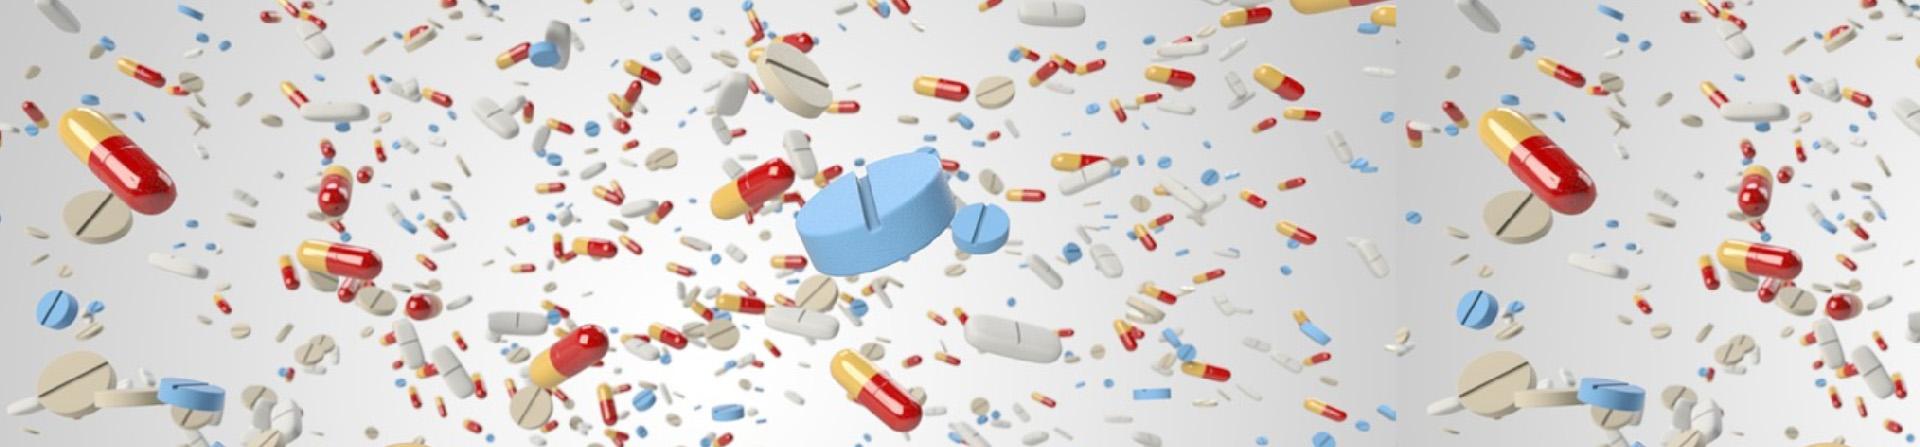 BA_ IRDEIC_Enjeux Pharma_EU_2018.jpg